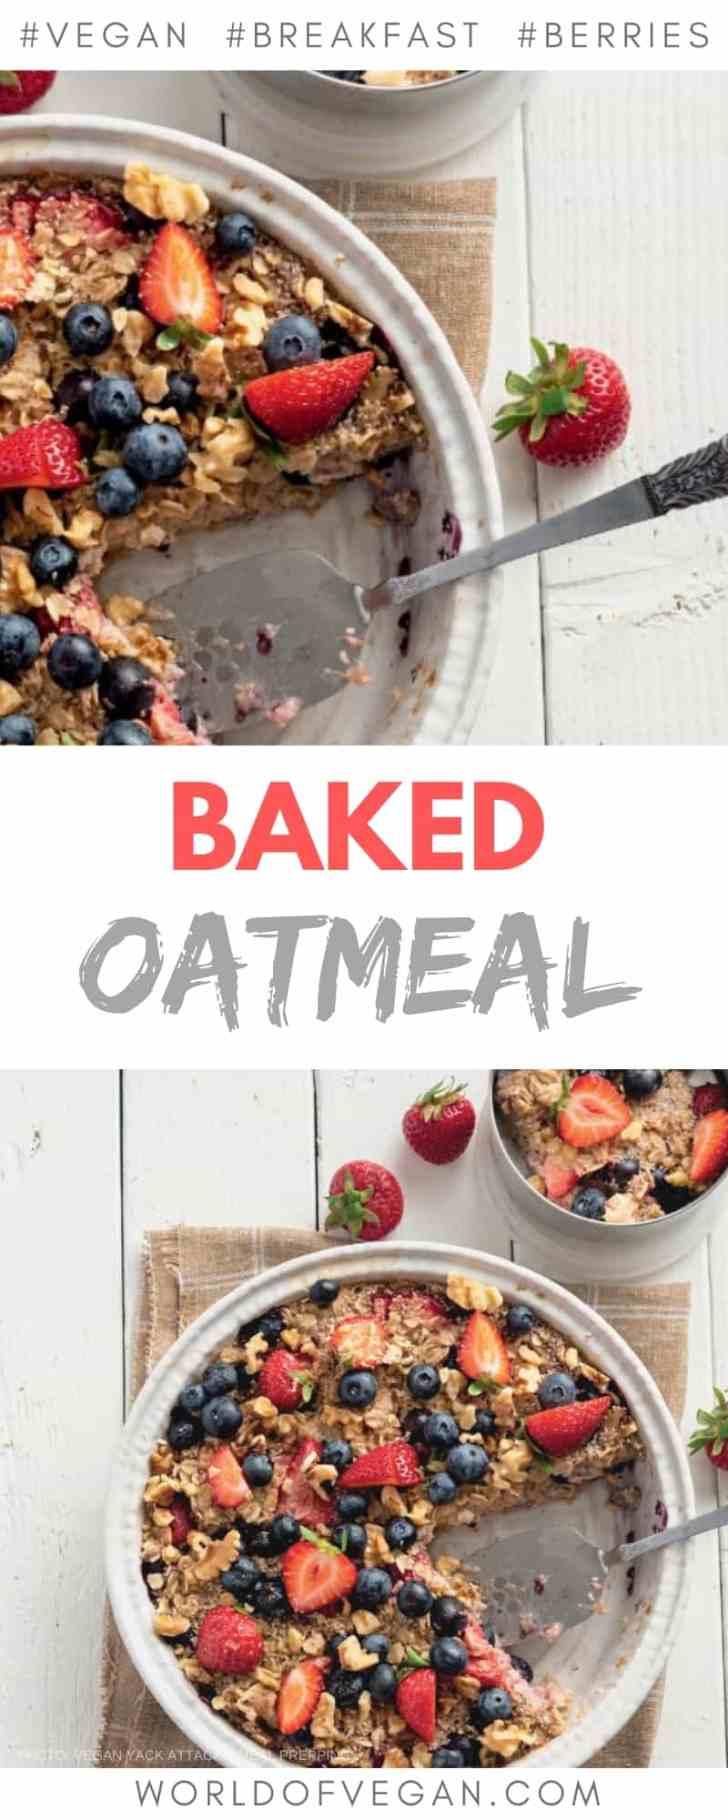 Baked Oatmeal with Berries   Easy Vegan Breakfast   World of Vegan   #breakfast #oatmeal #vegan #berries #baked #easy